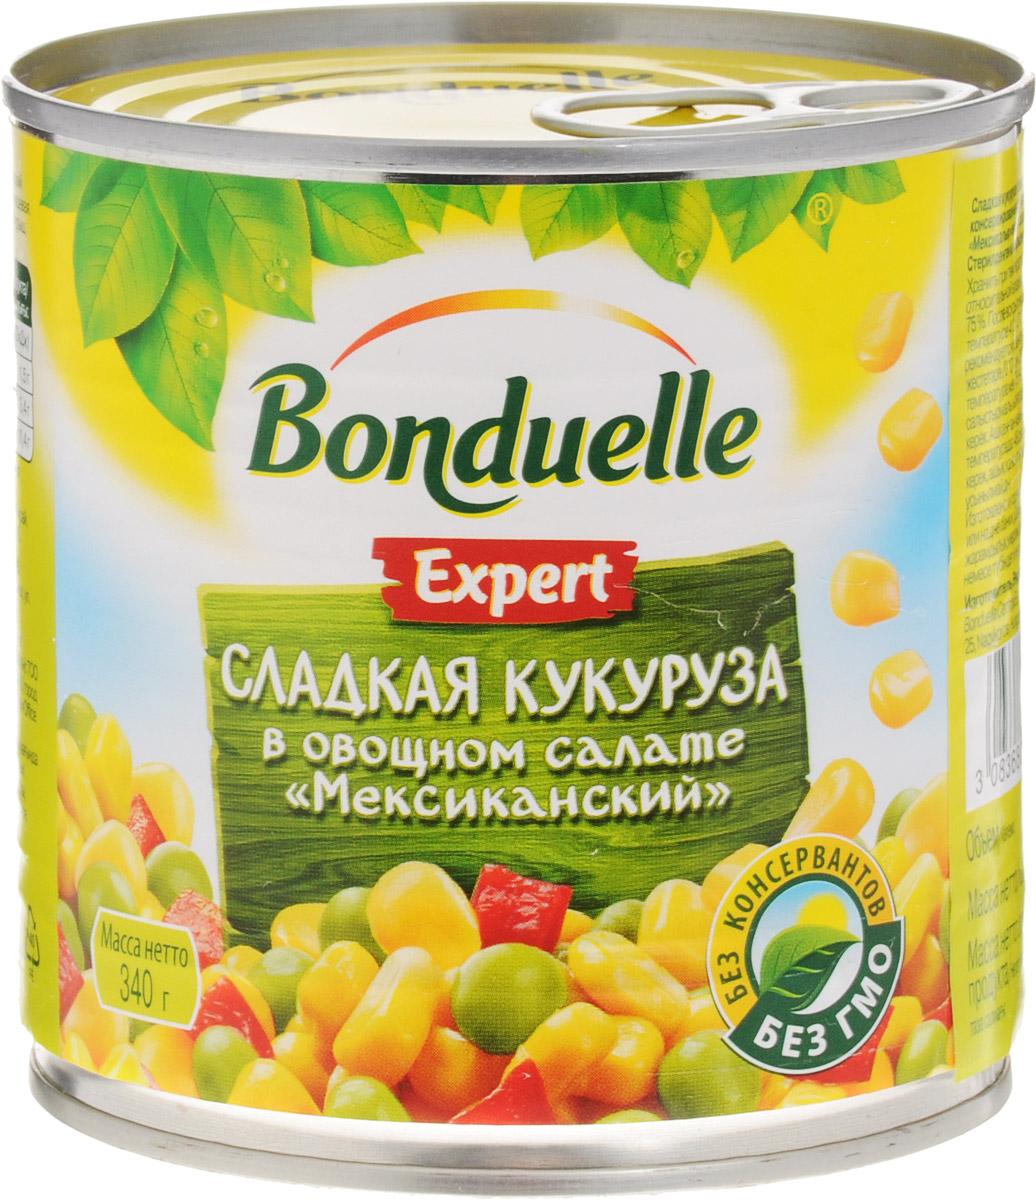 Bonduelle овощная смесь Мексиканская, 340 г bonduelle кукуруза сладкая 340 г